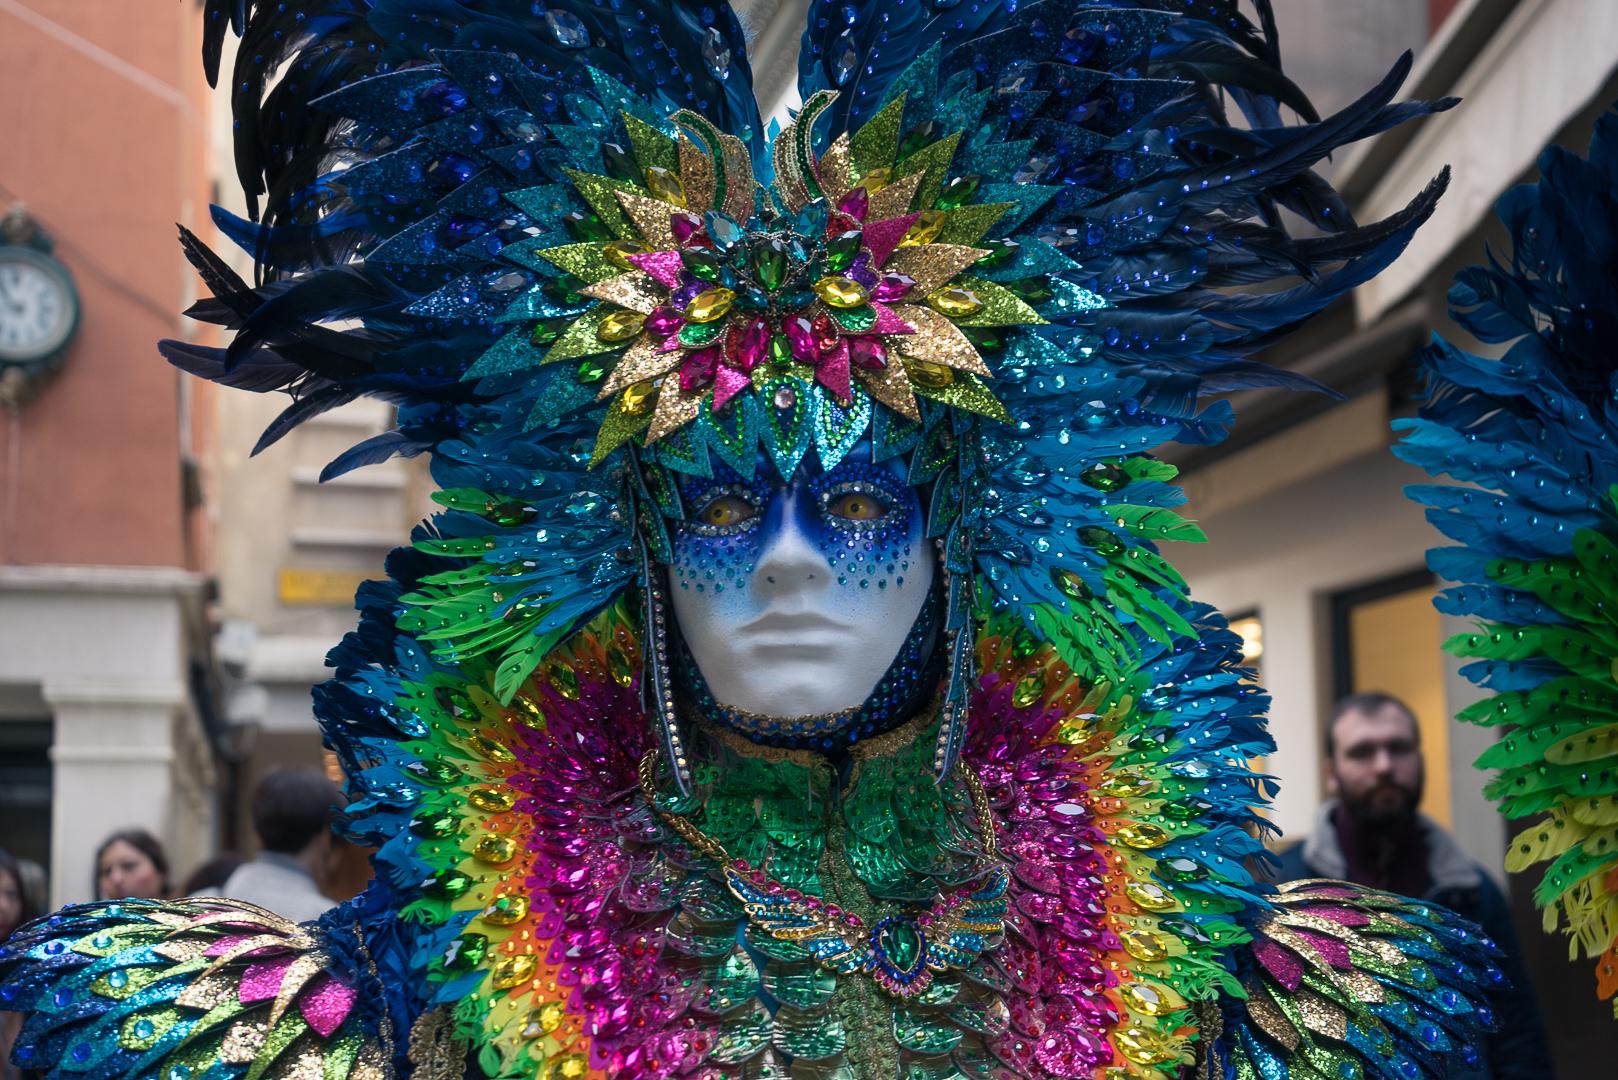 Venice Carnival as an Introvert Photographer